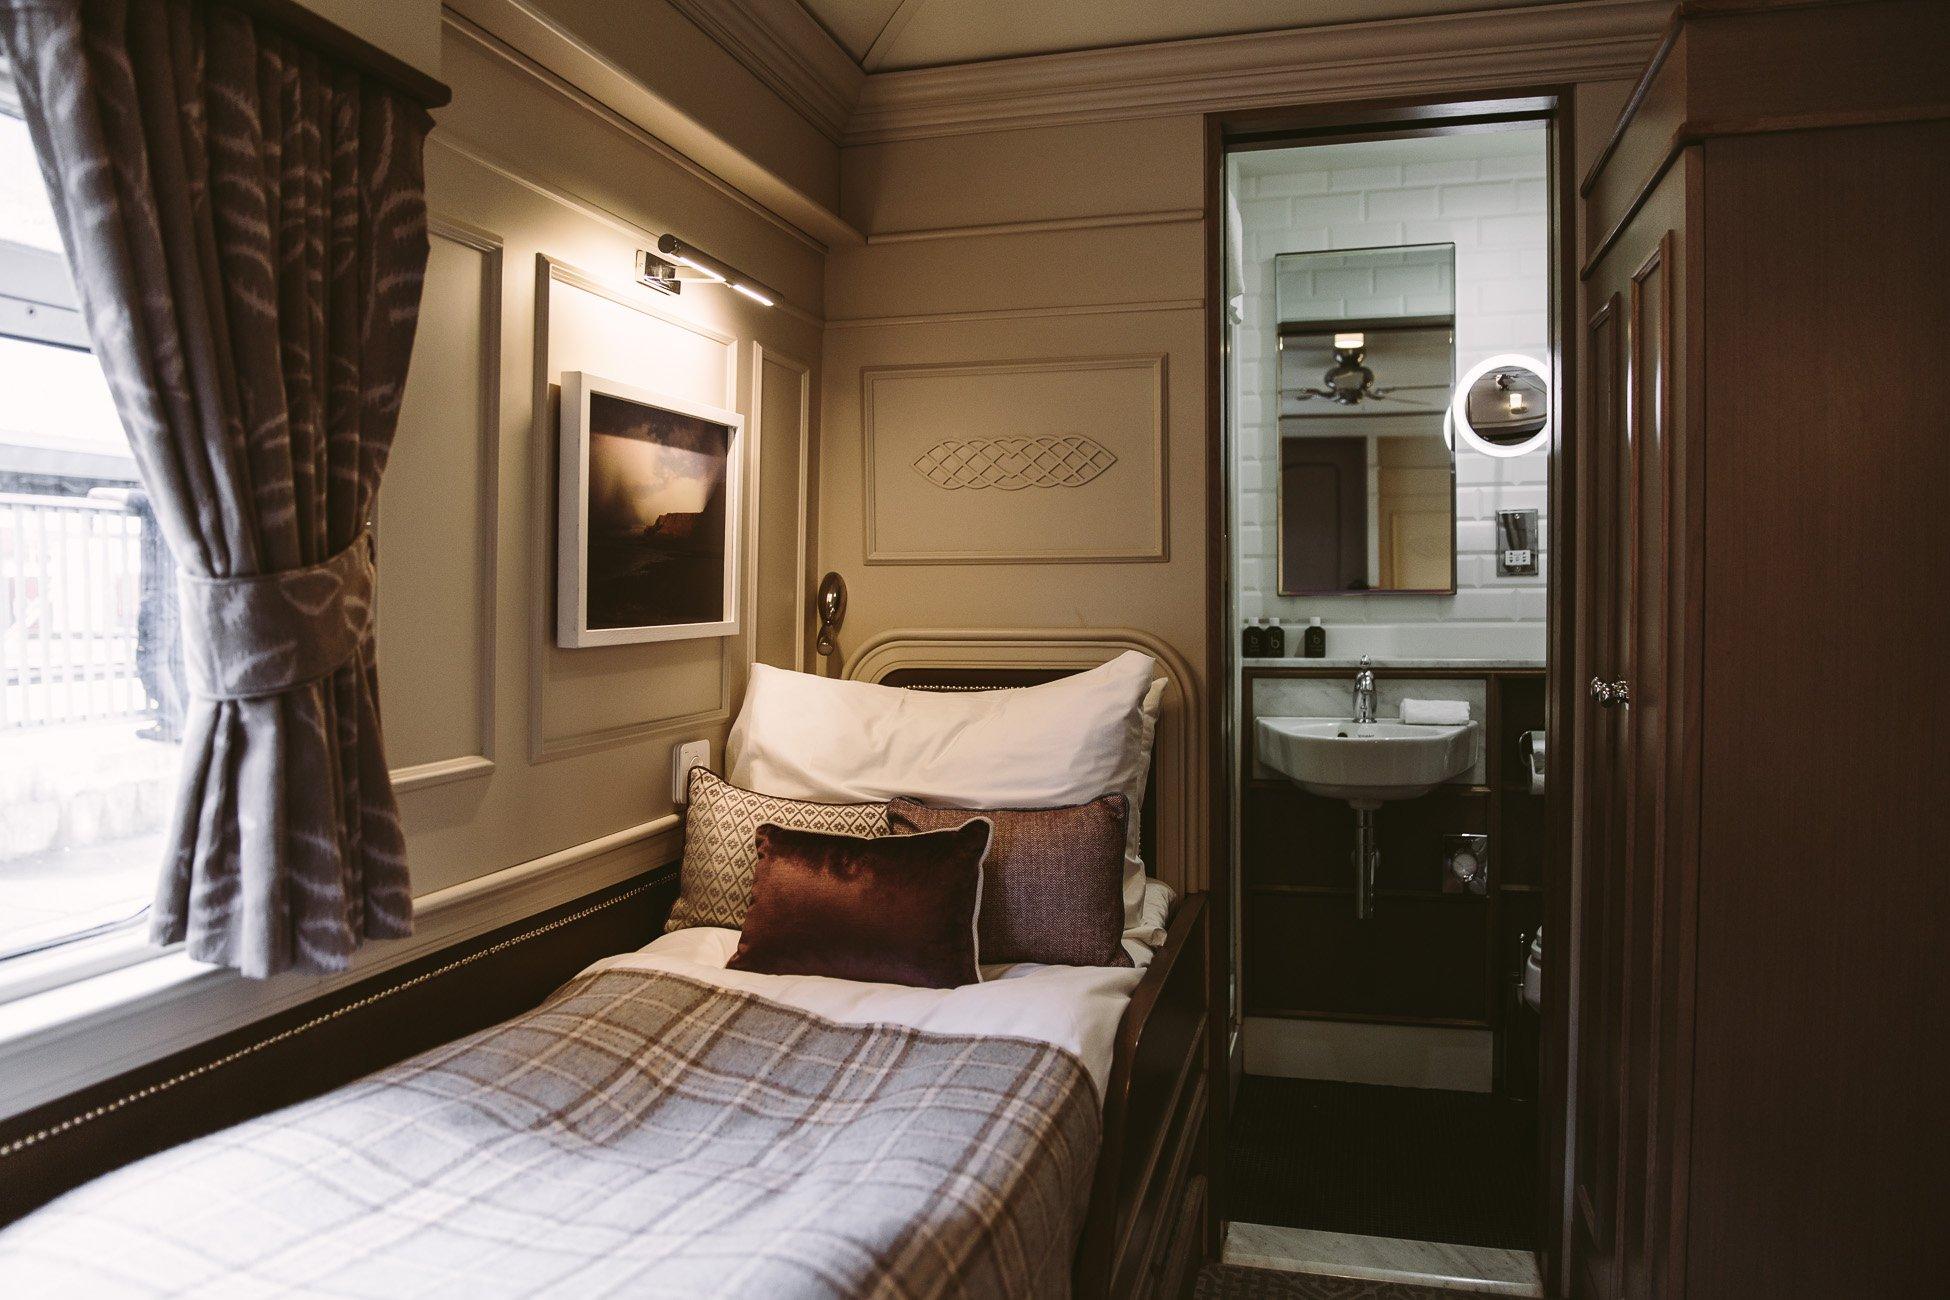 Cabin at the Belmond Grand Hibernian